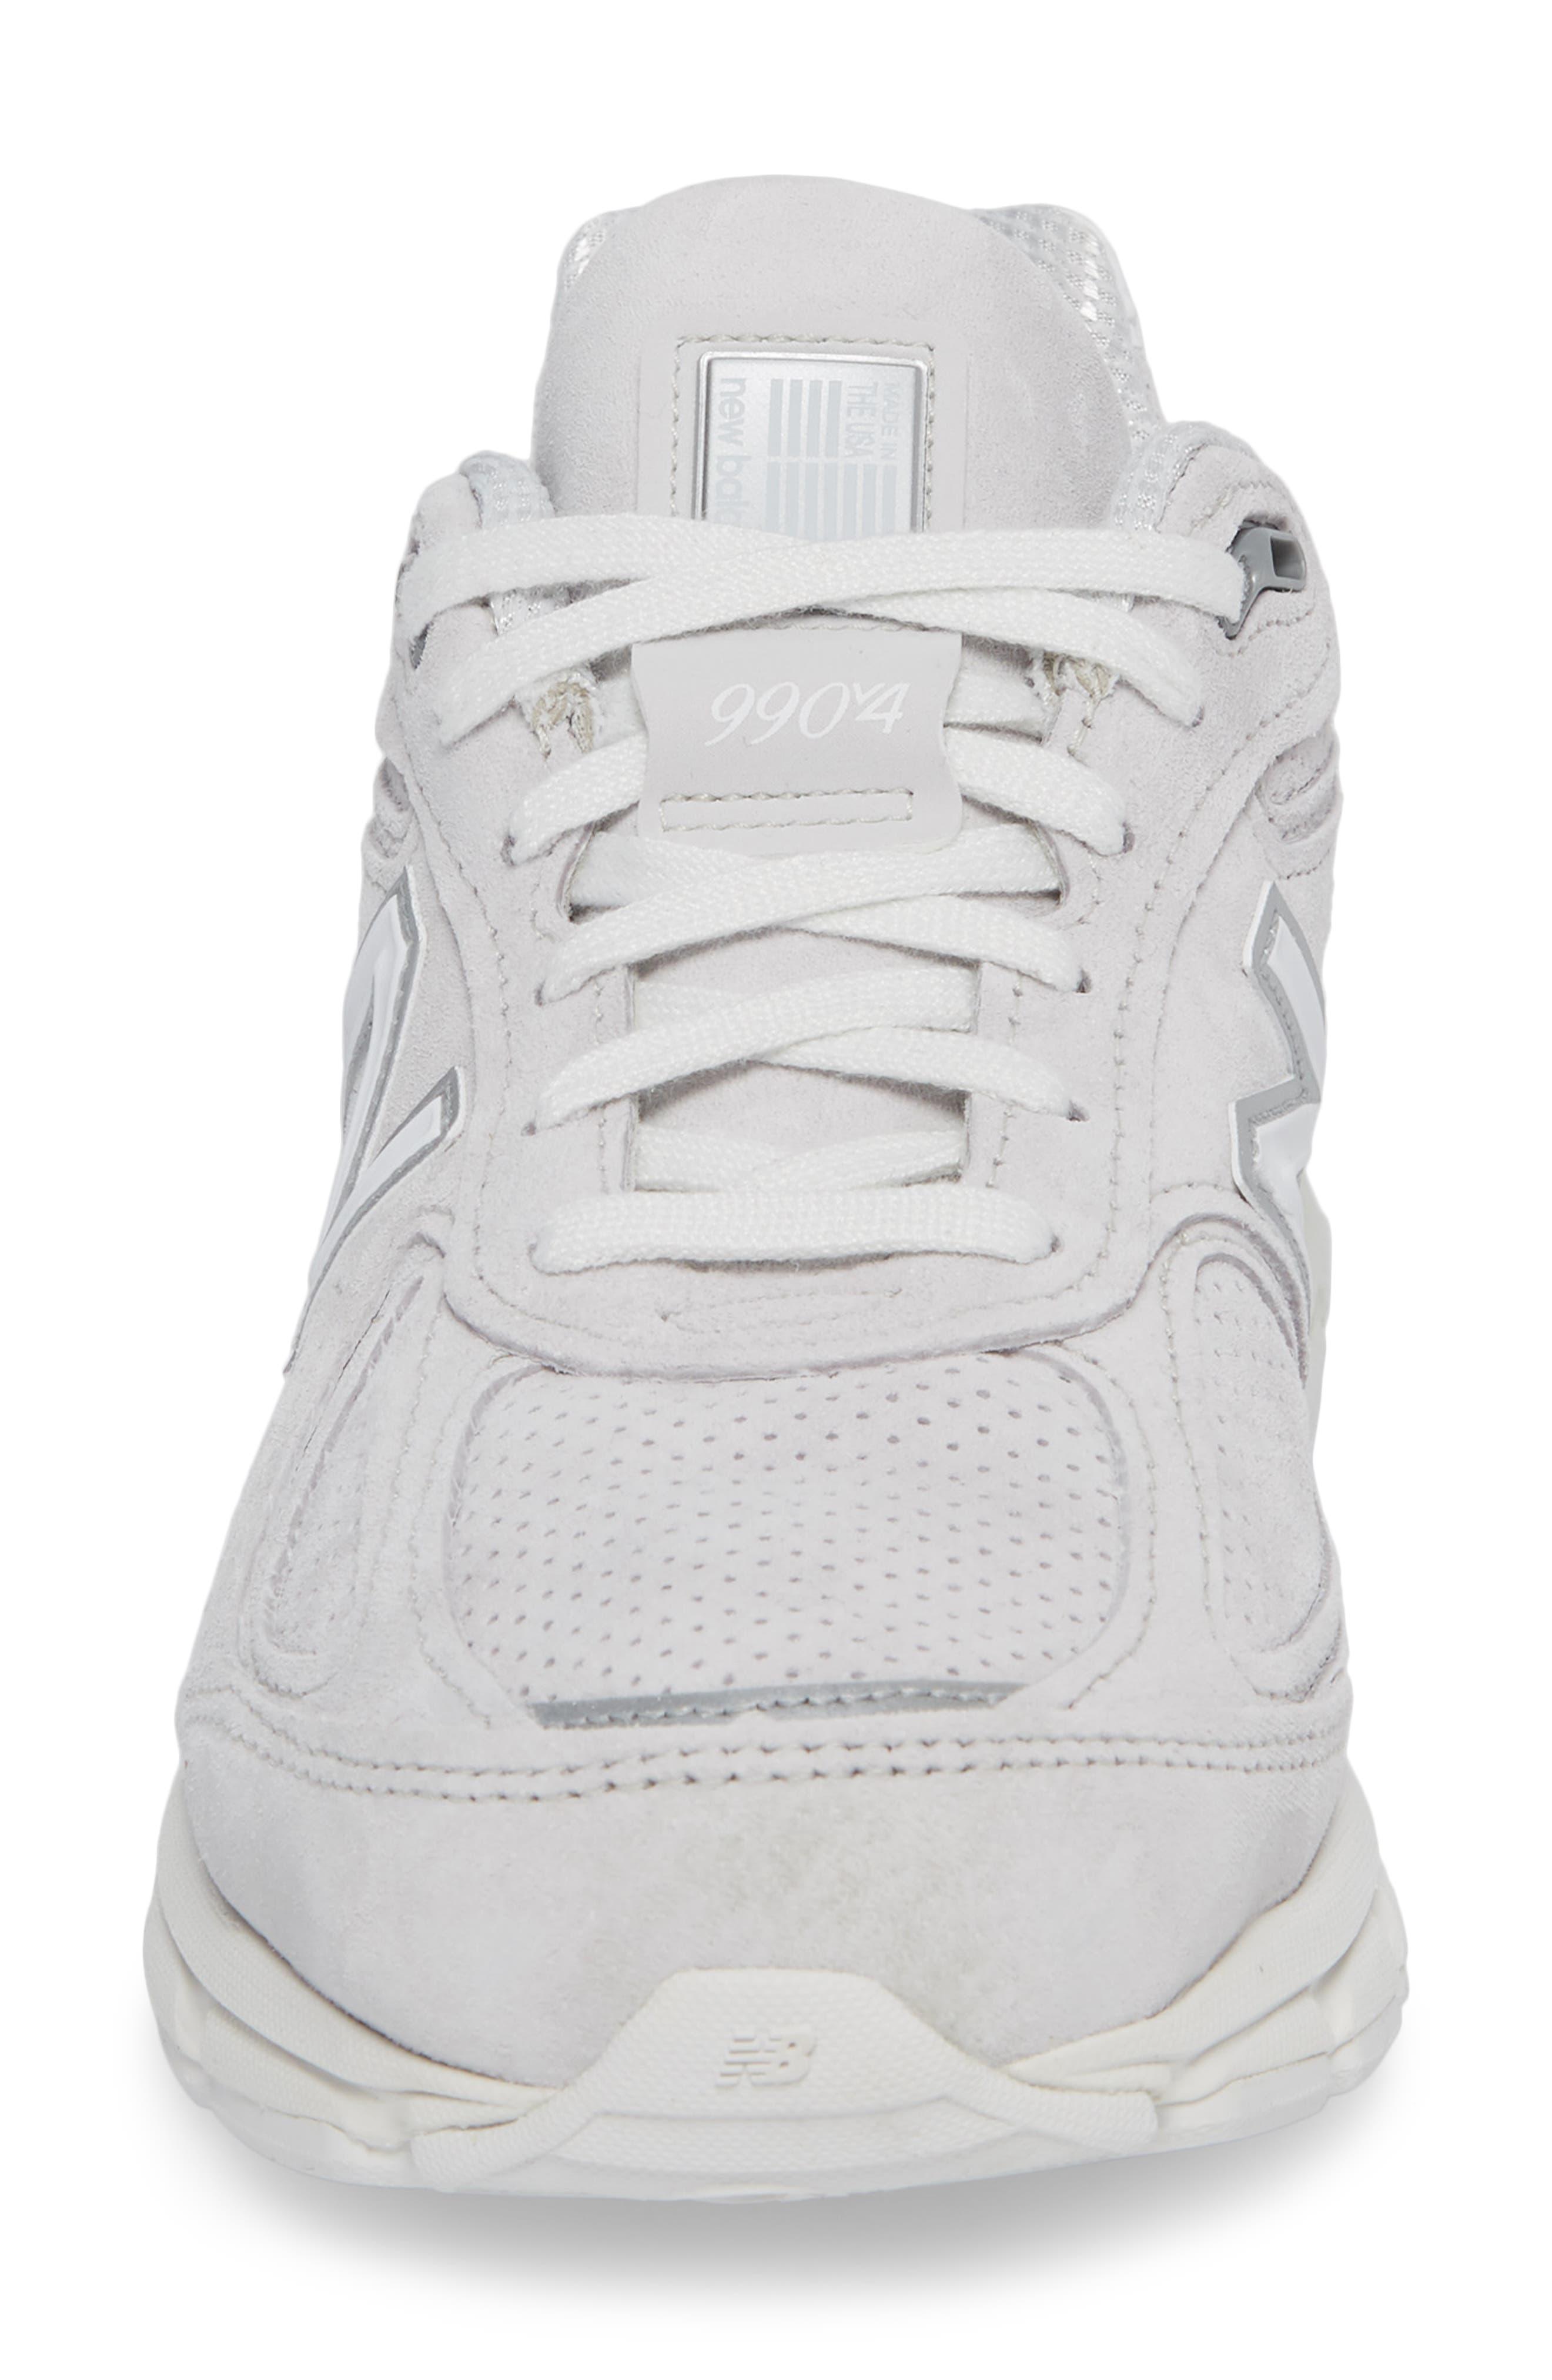 990v4 Perforated Sneaker,                             Alternate thumbnail 4, color,                             034